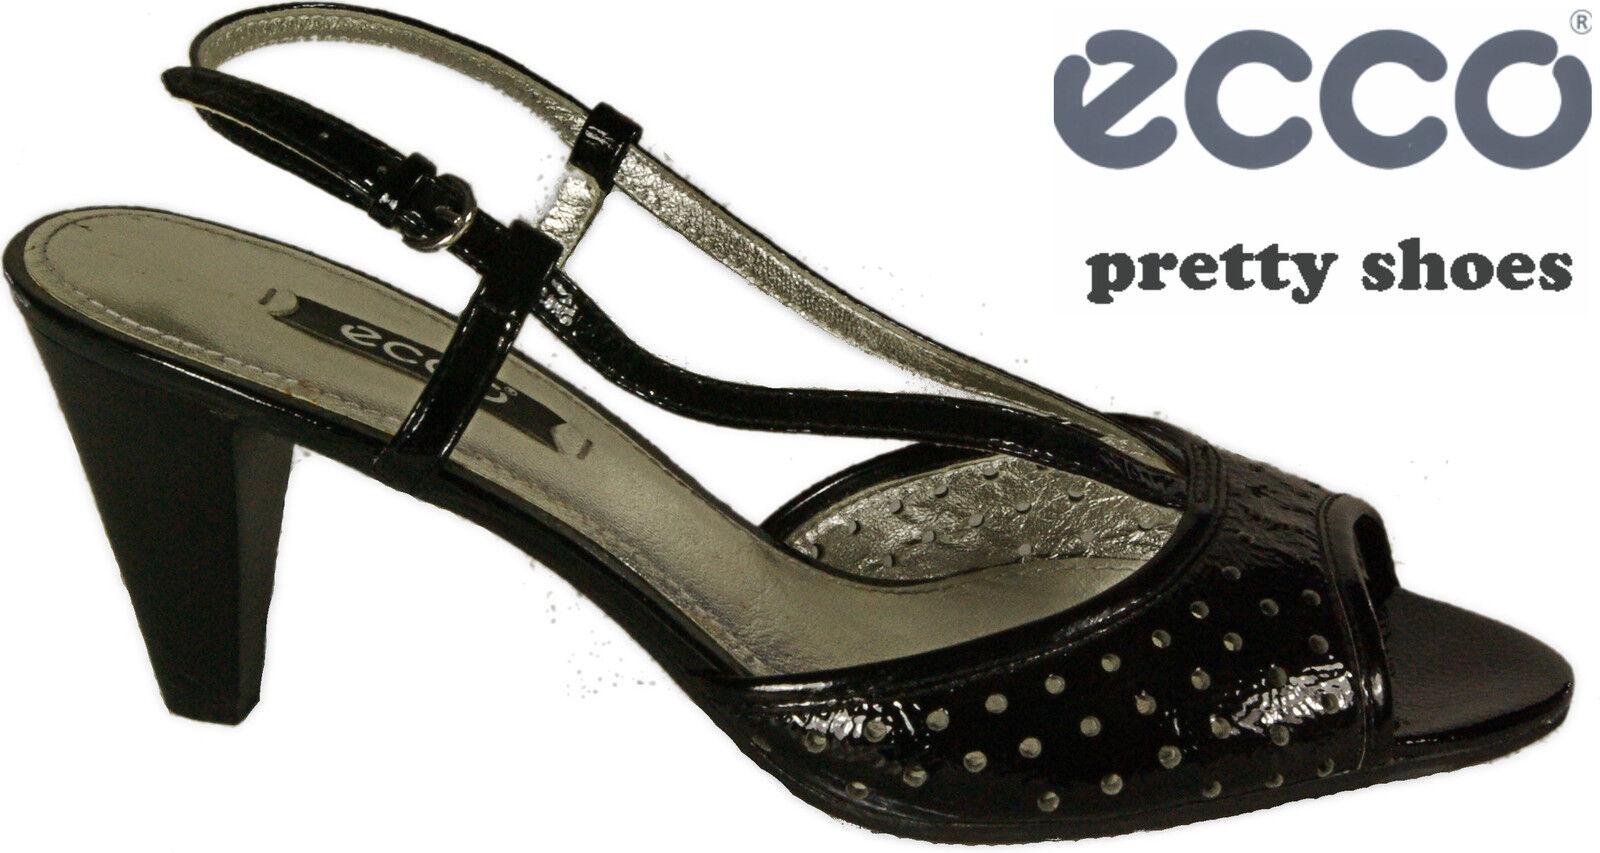 ECCO Schuhe elegante Sandaletten Sling Pumps schwarz  Lack  Leder High Heel NEU